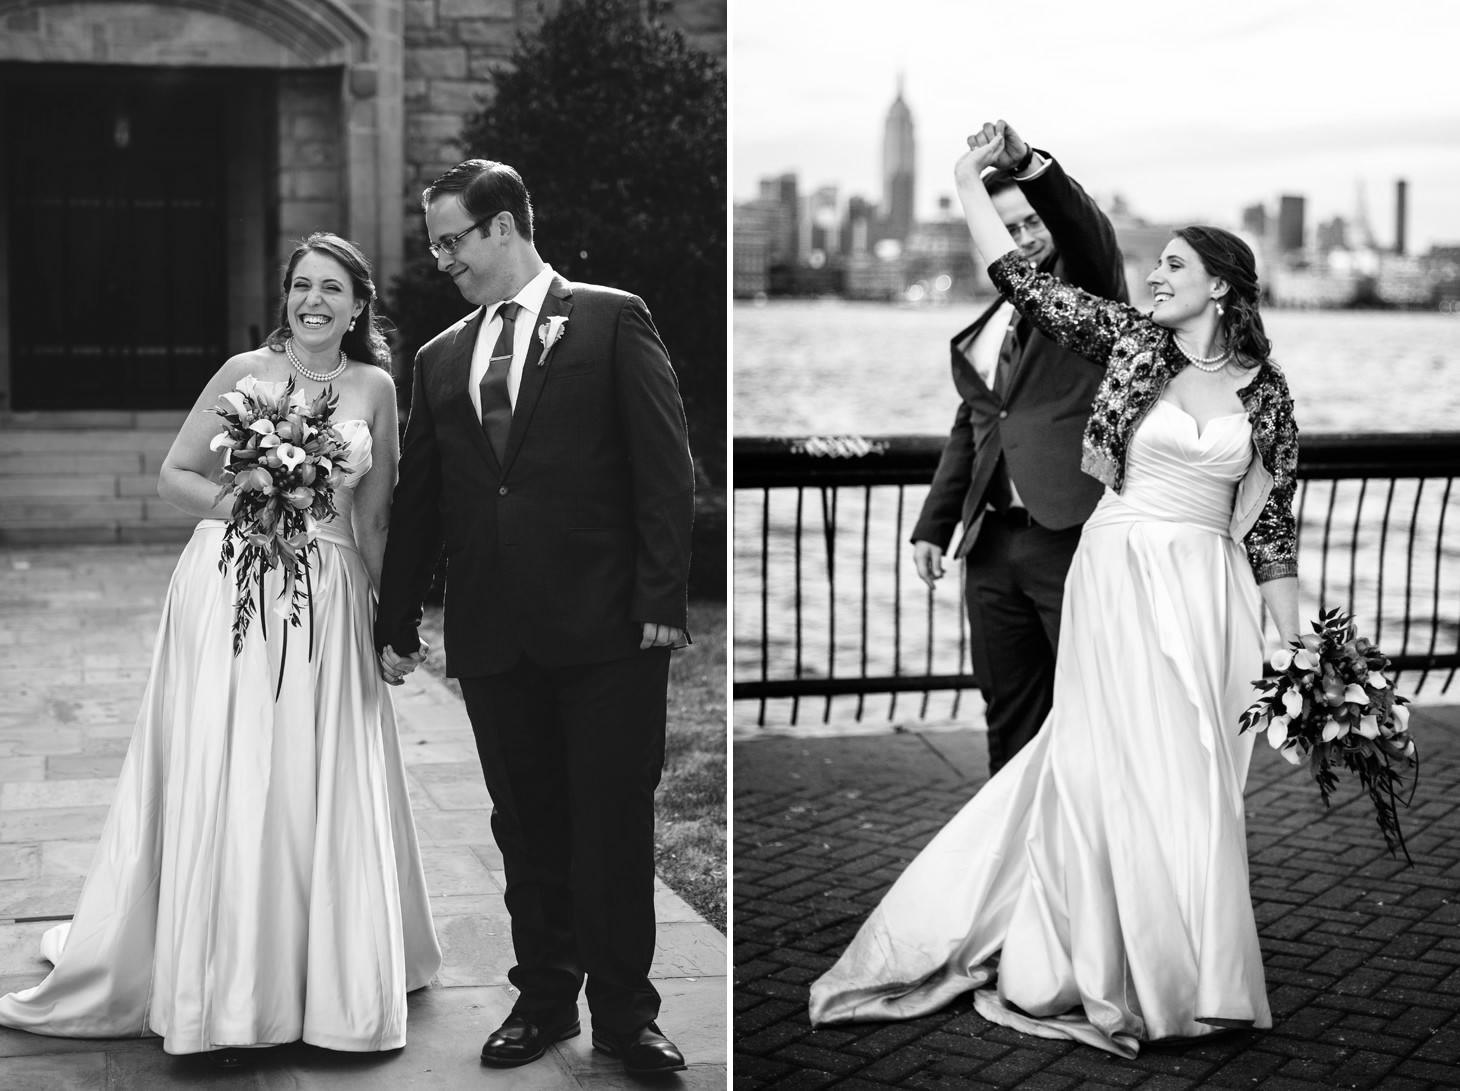 034-nyc-wedding-photographer-smitten-chickens-elope-nyc-wedding-photographer-museum-wedding-smitten-chickens-hoboken.jpg